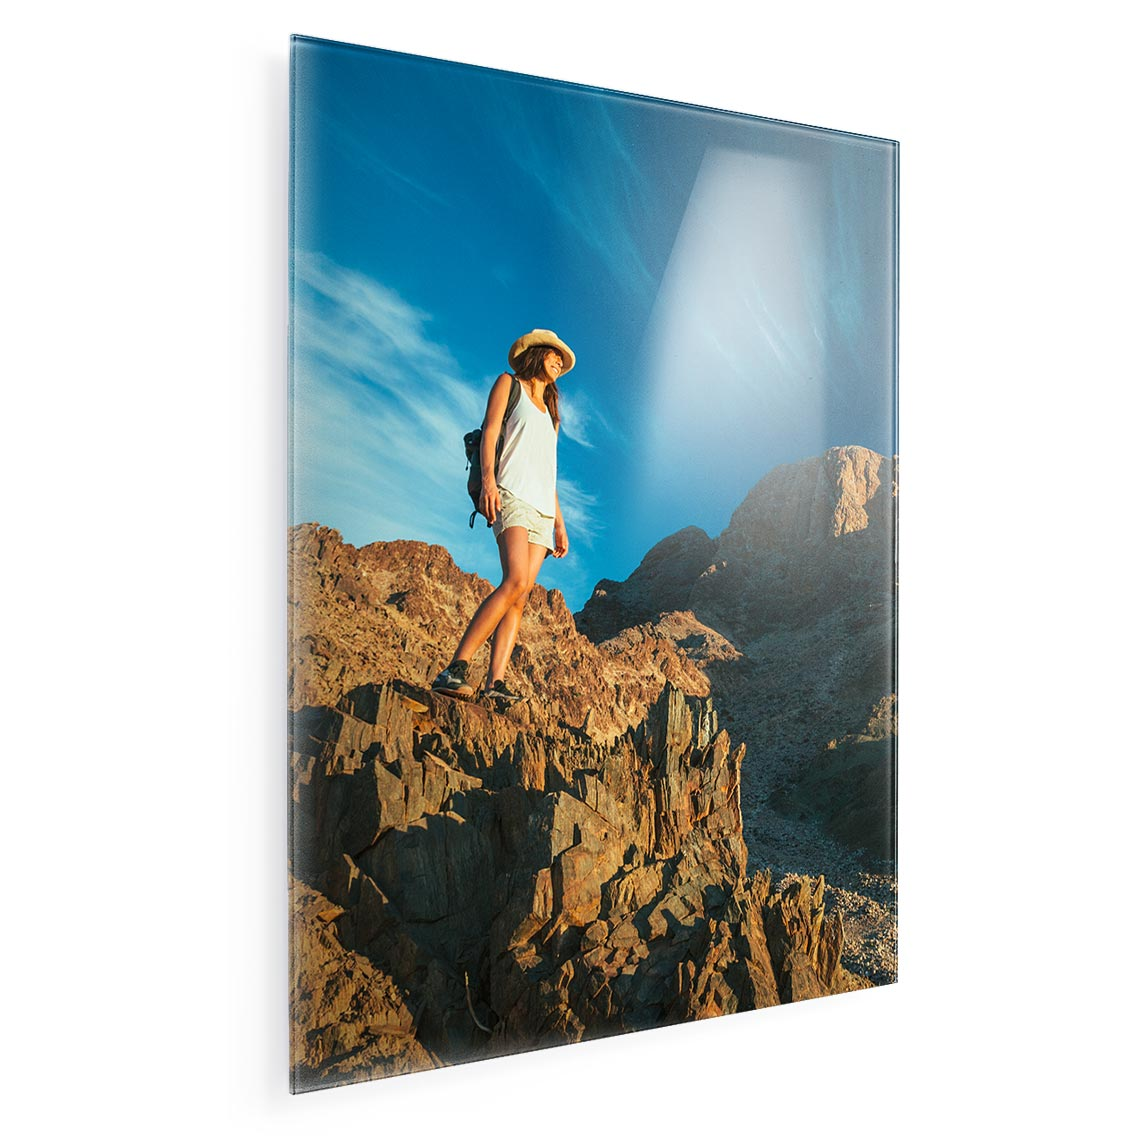 glass print 30x45cm 12x18 glass prints canvas home decor